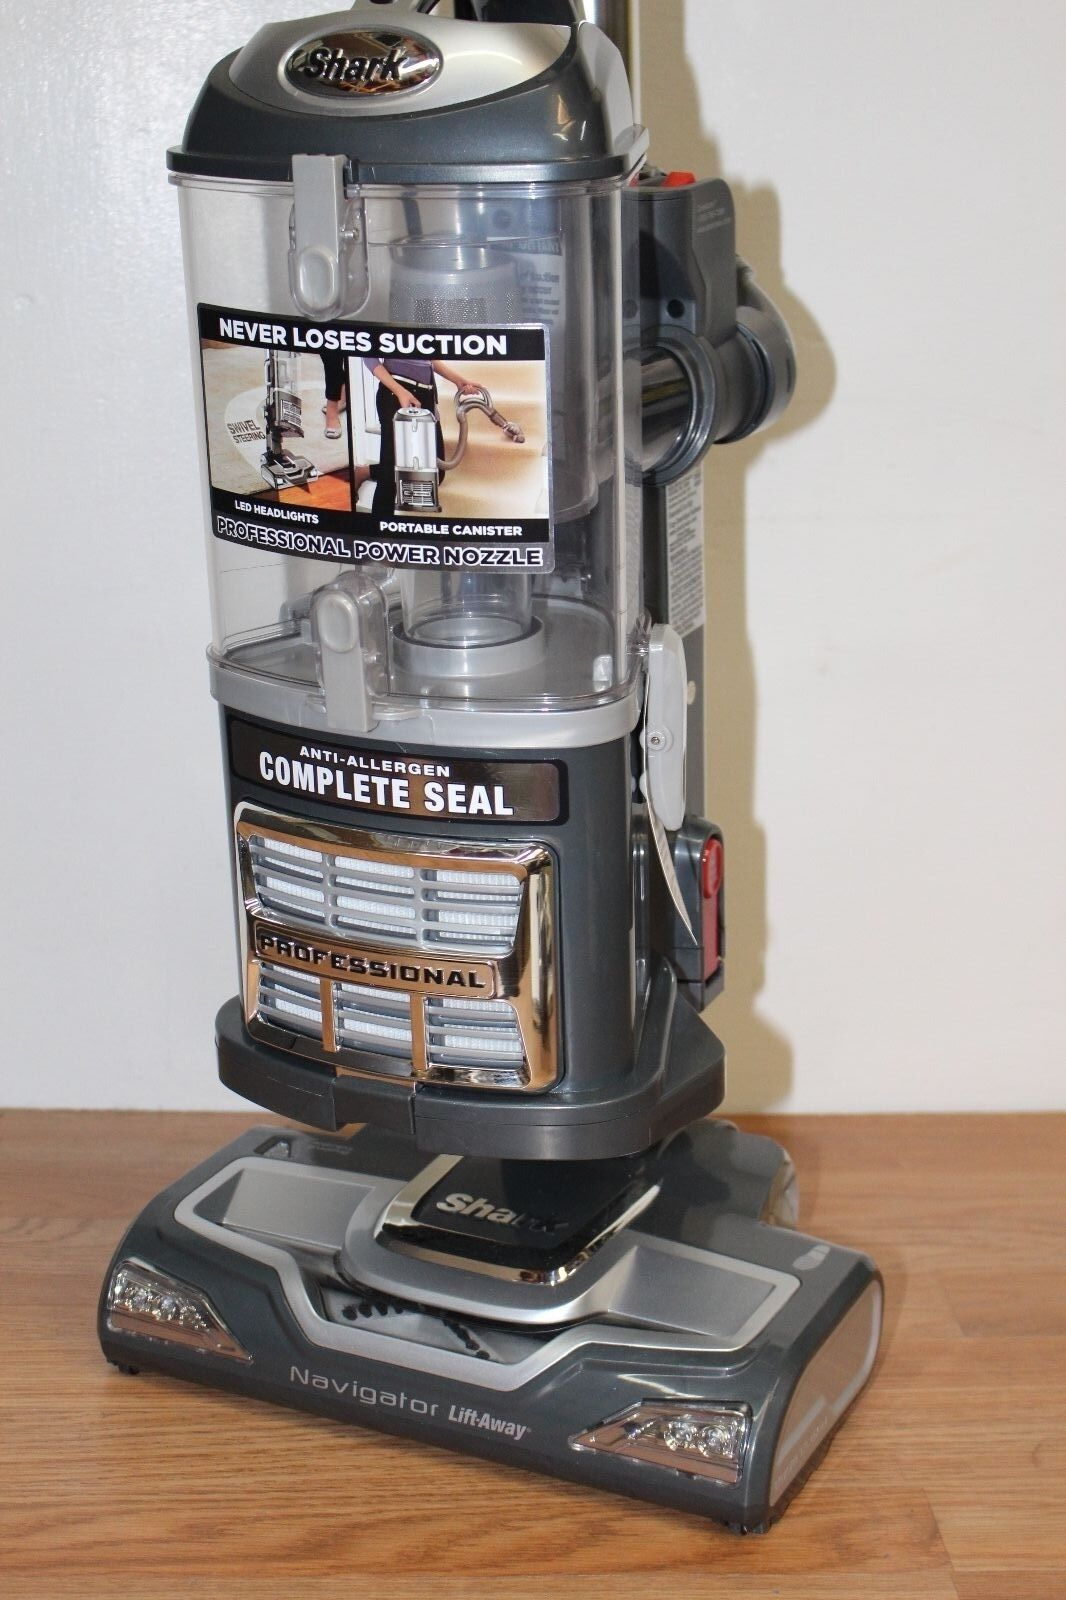 Shark Navigator Uv540 Lift Away Bagless Vacuum Cleaner Ebay